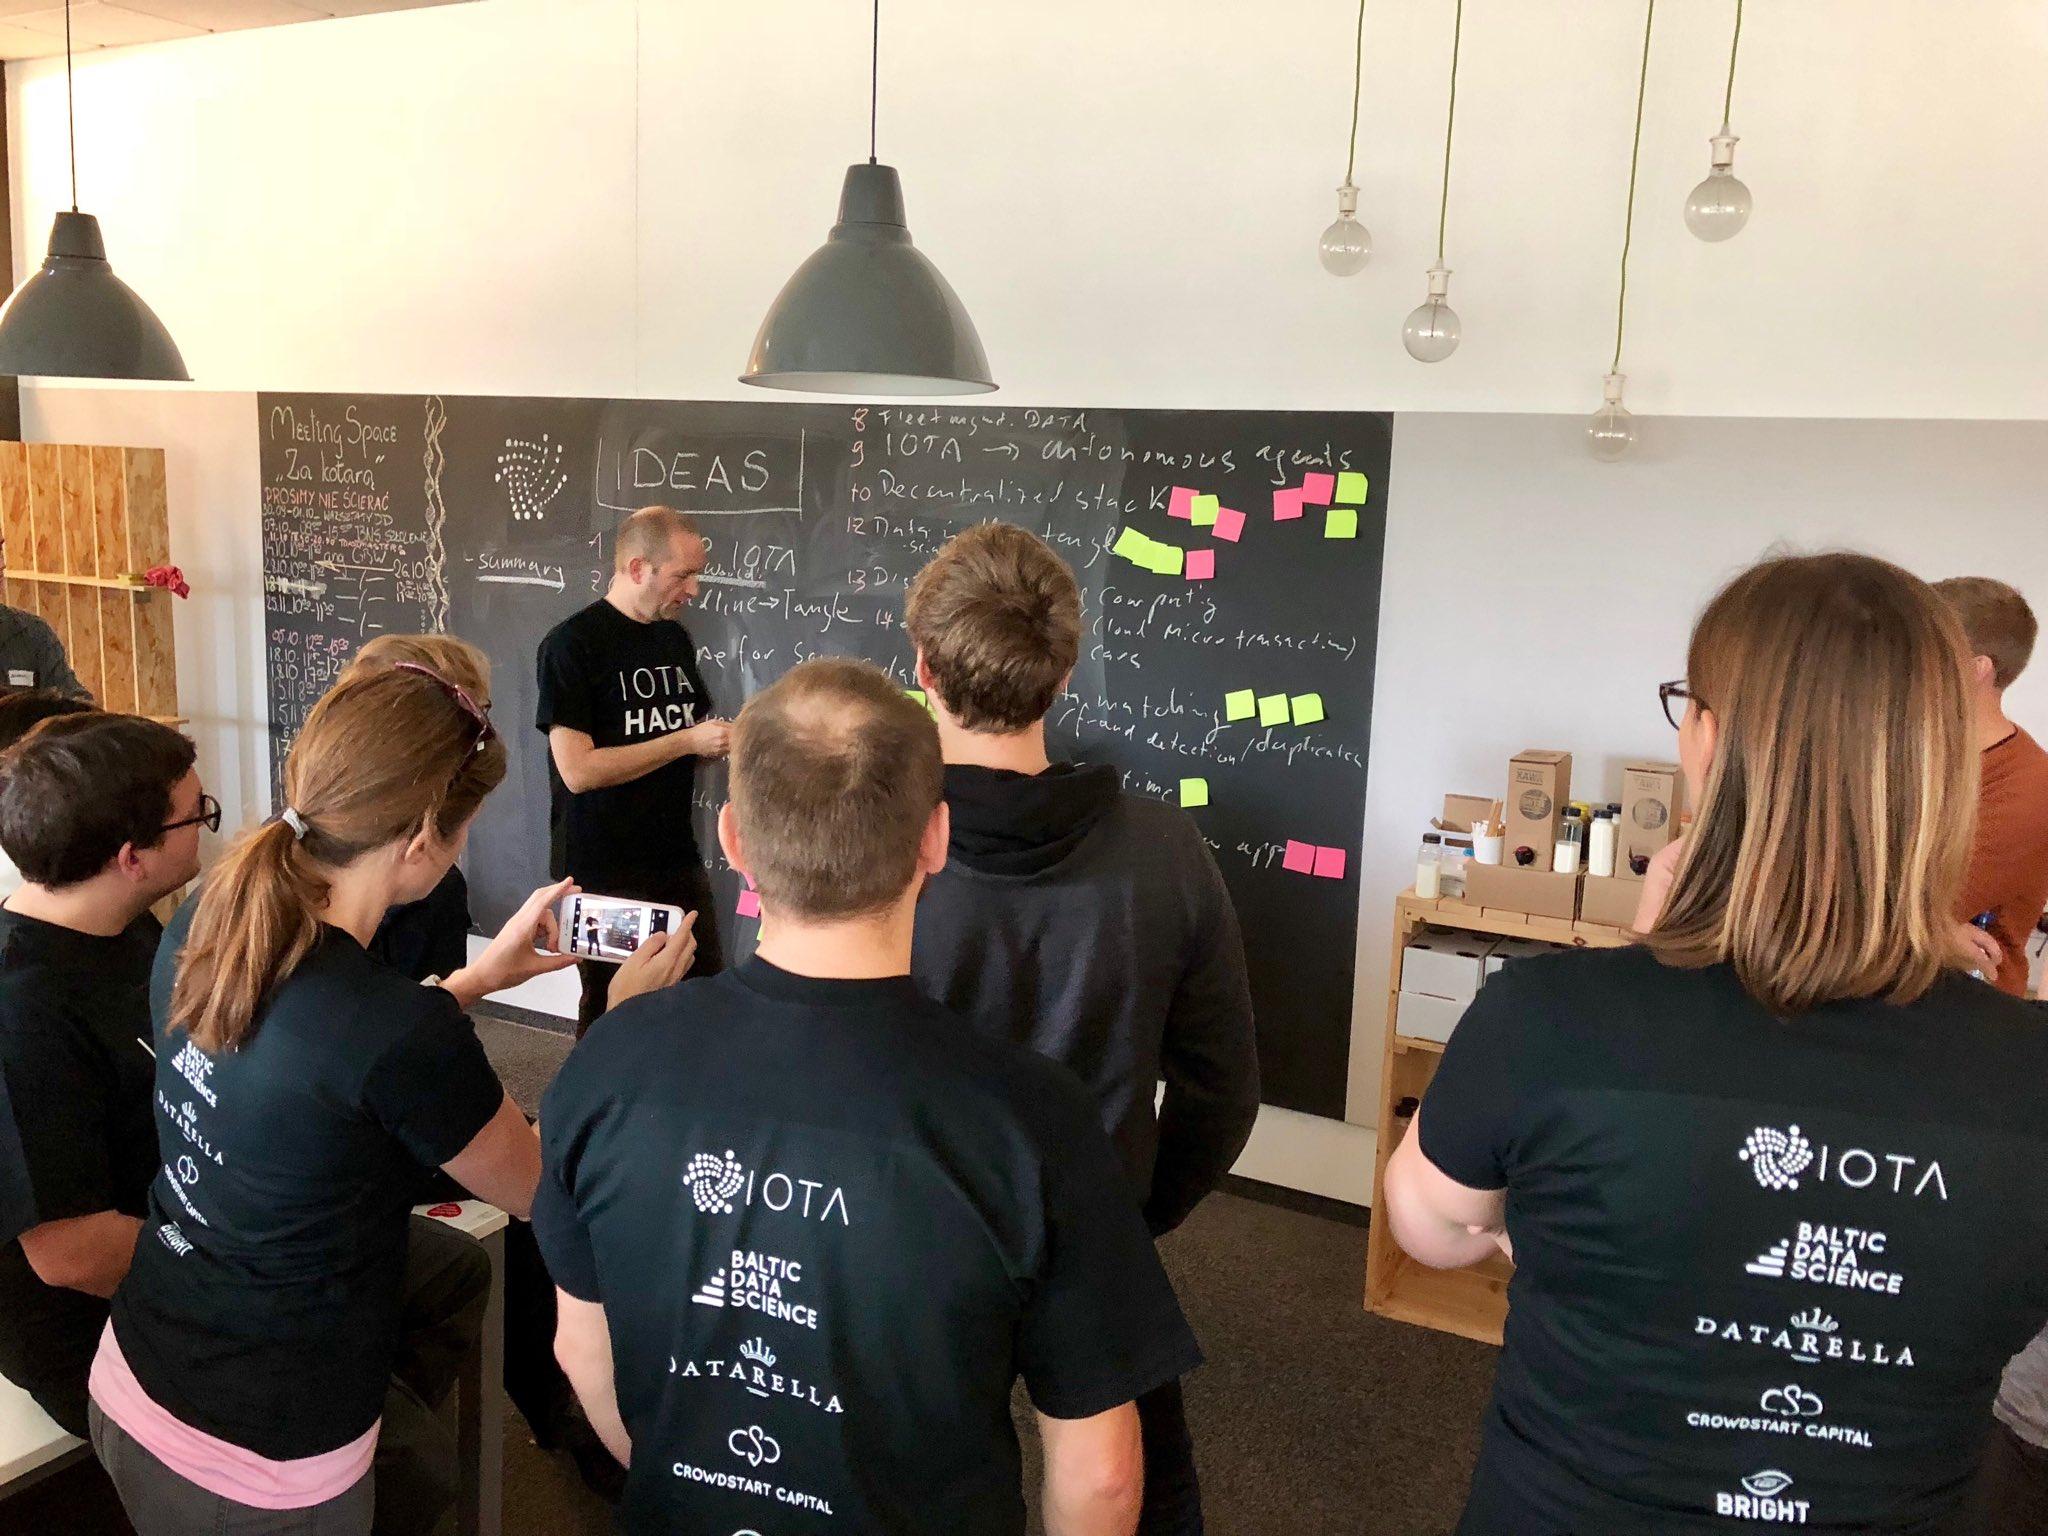 IOTA Hackathon: Open Car Charging Network (Part 1)